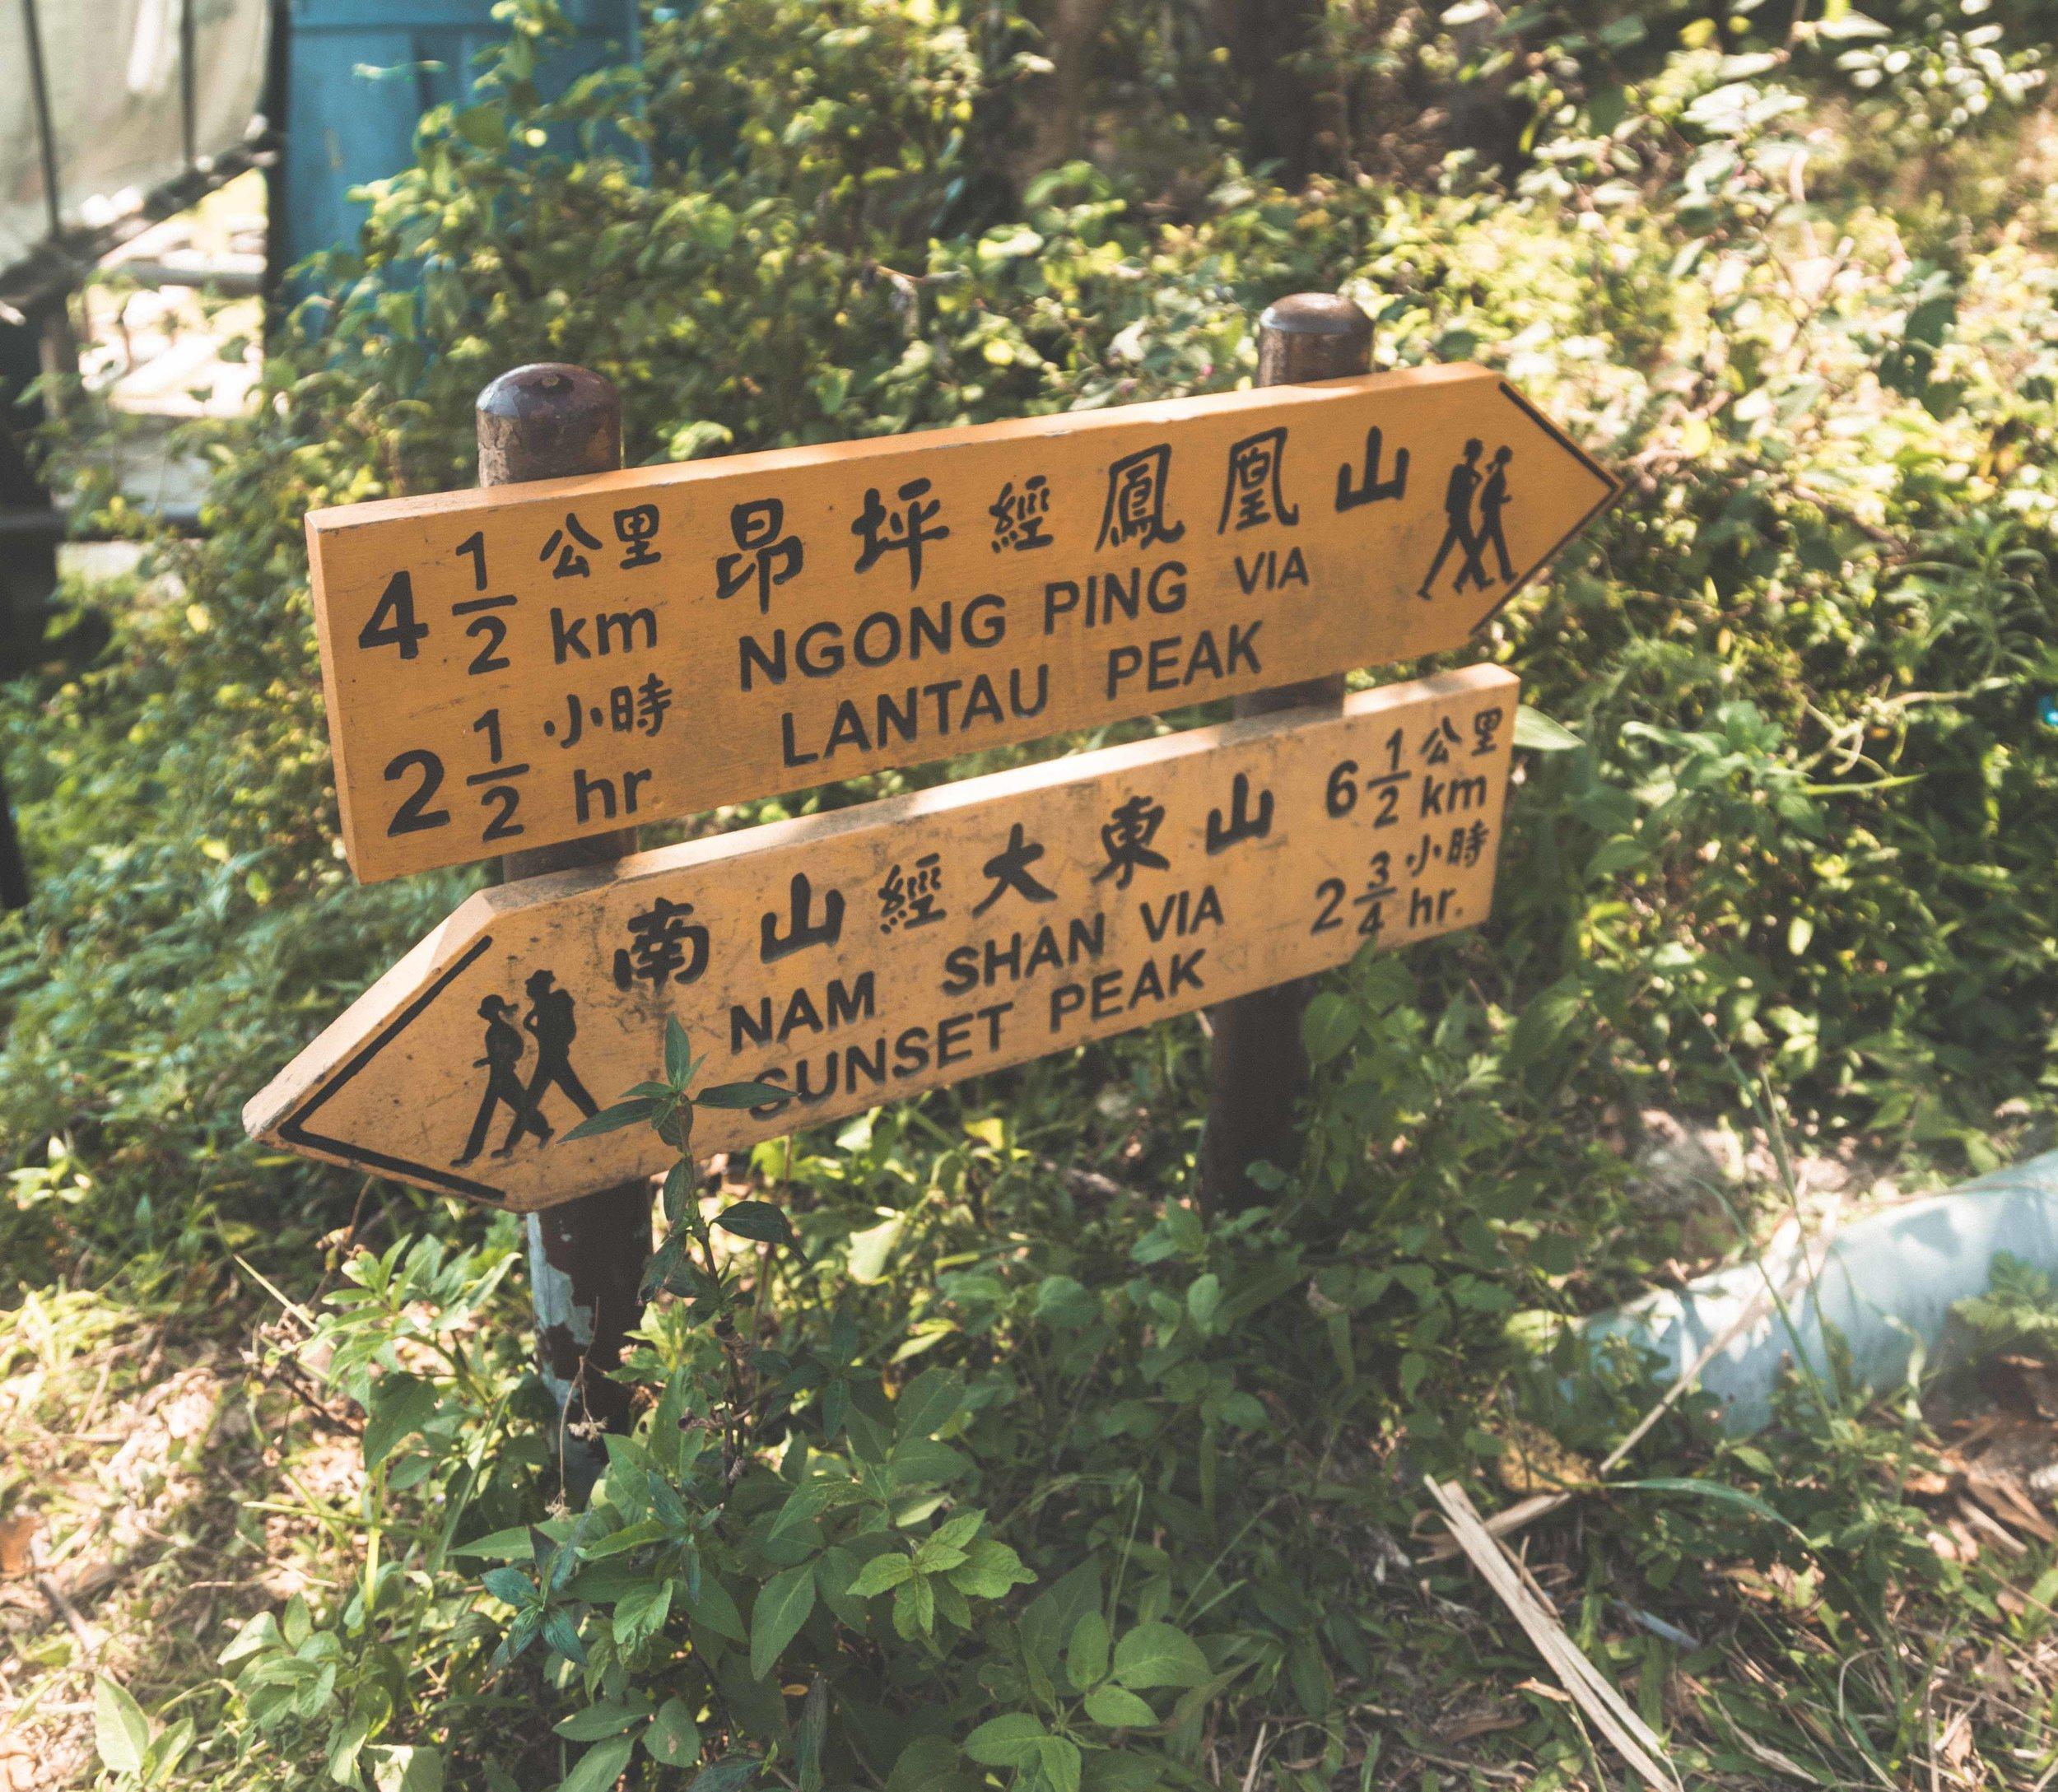 The correct start sign for Lantau Peak